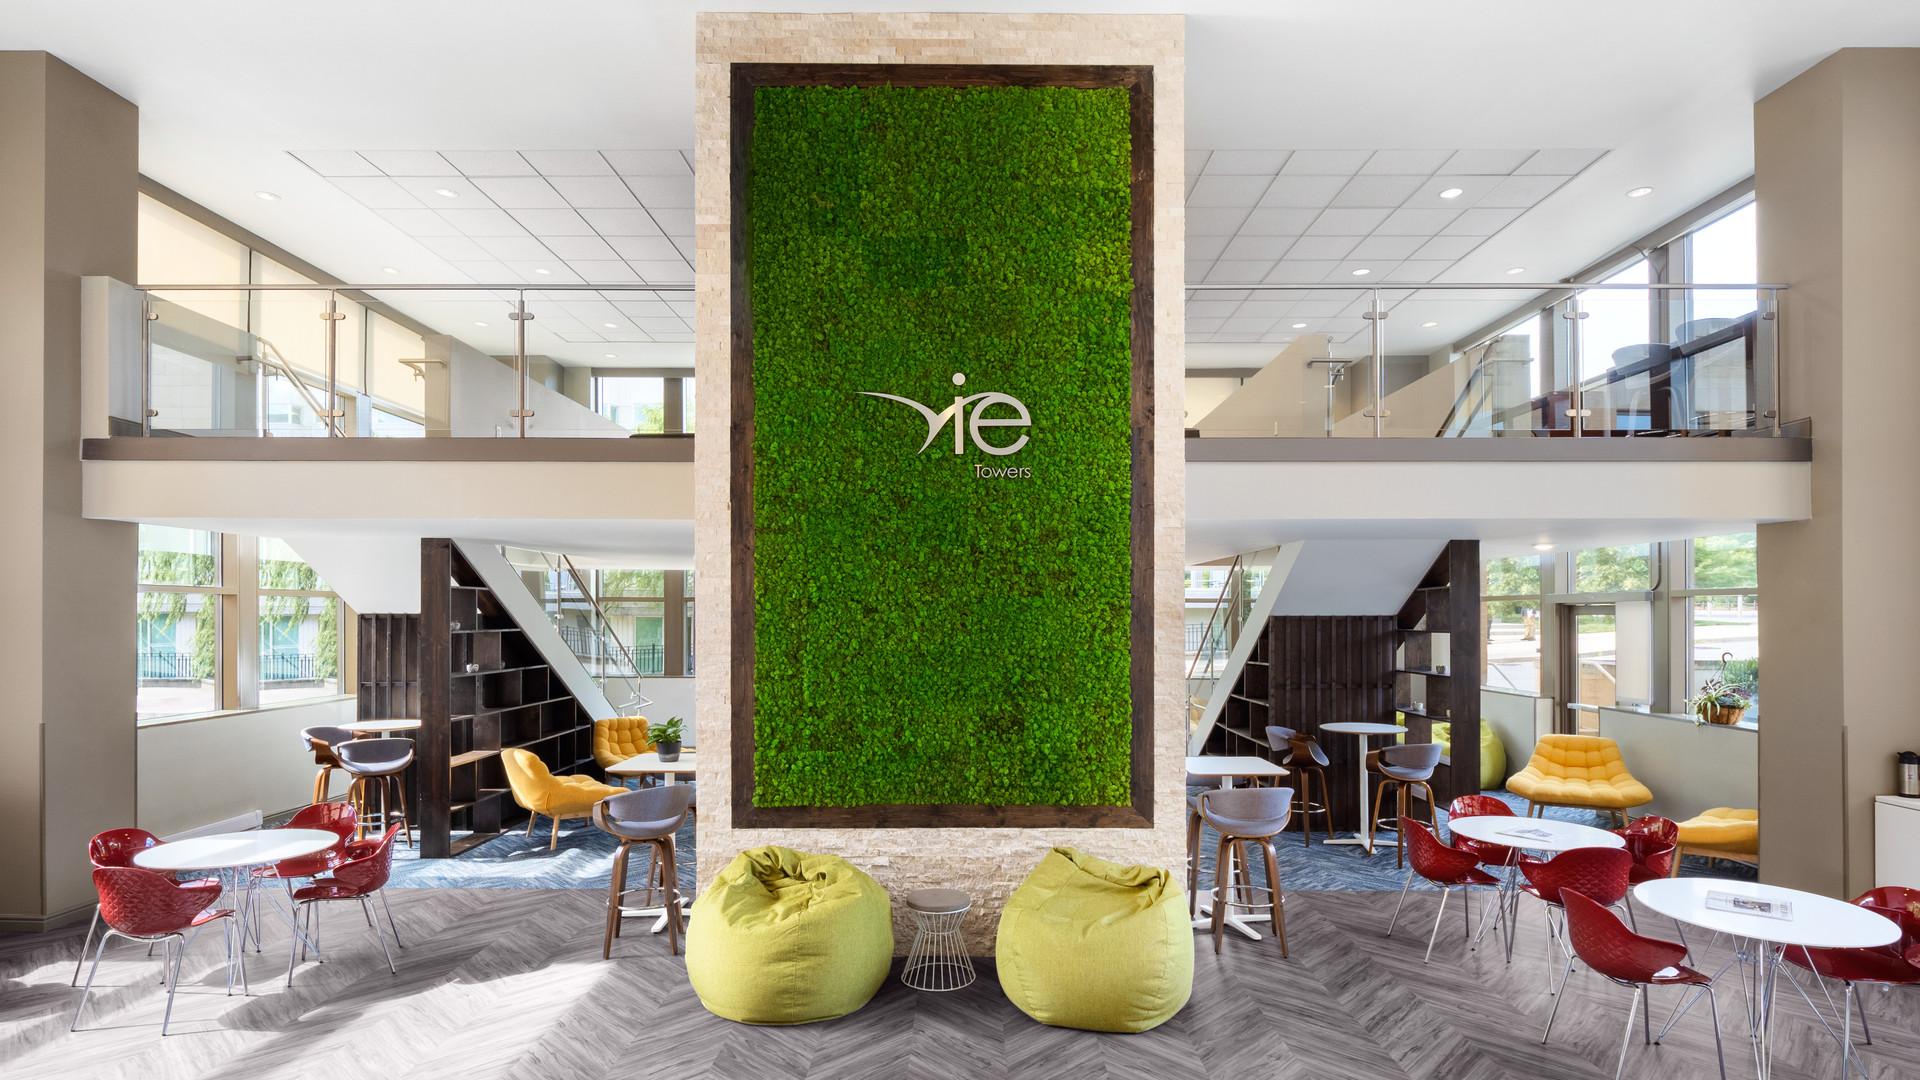 Vie-Towers_Kahvie-Lounge_AV_190625_62500